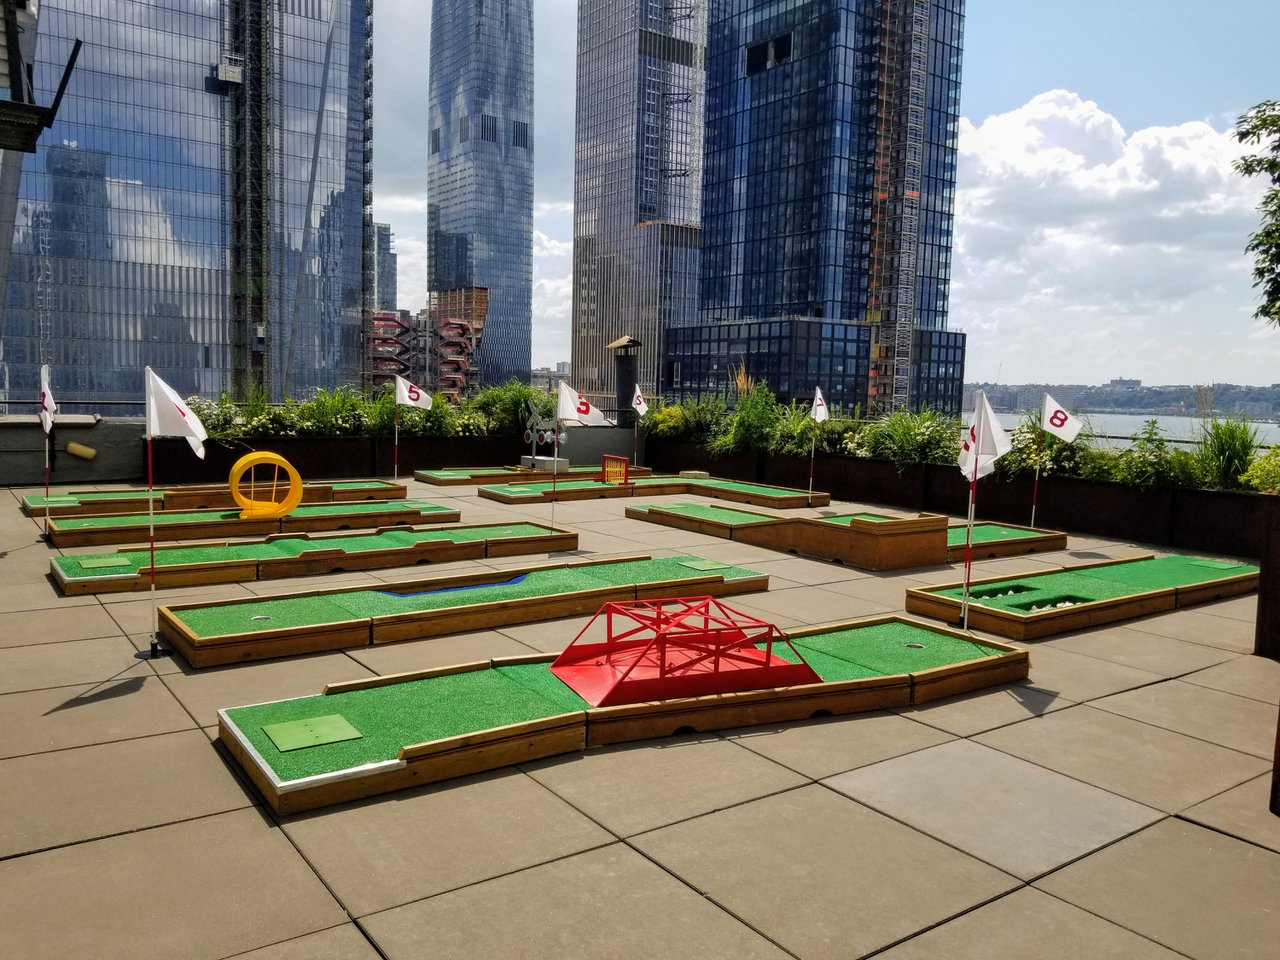 Mini Golf on NYC Rooftop photo Mini-Golf-Rental-NYC-9-Holes.jpg